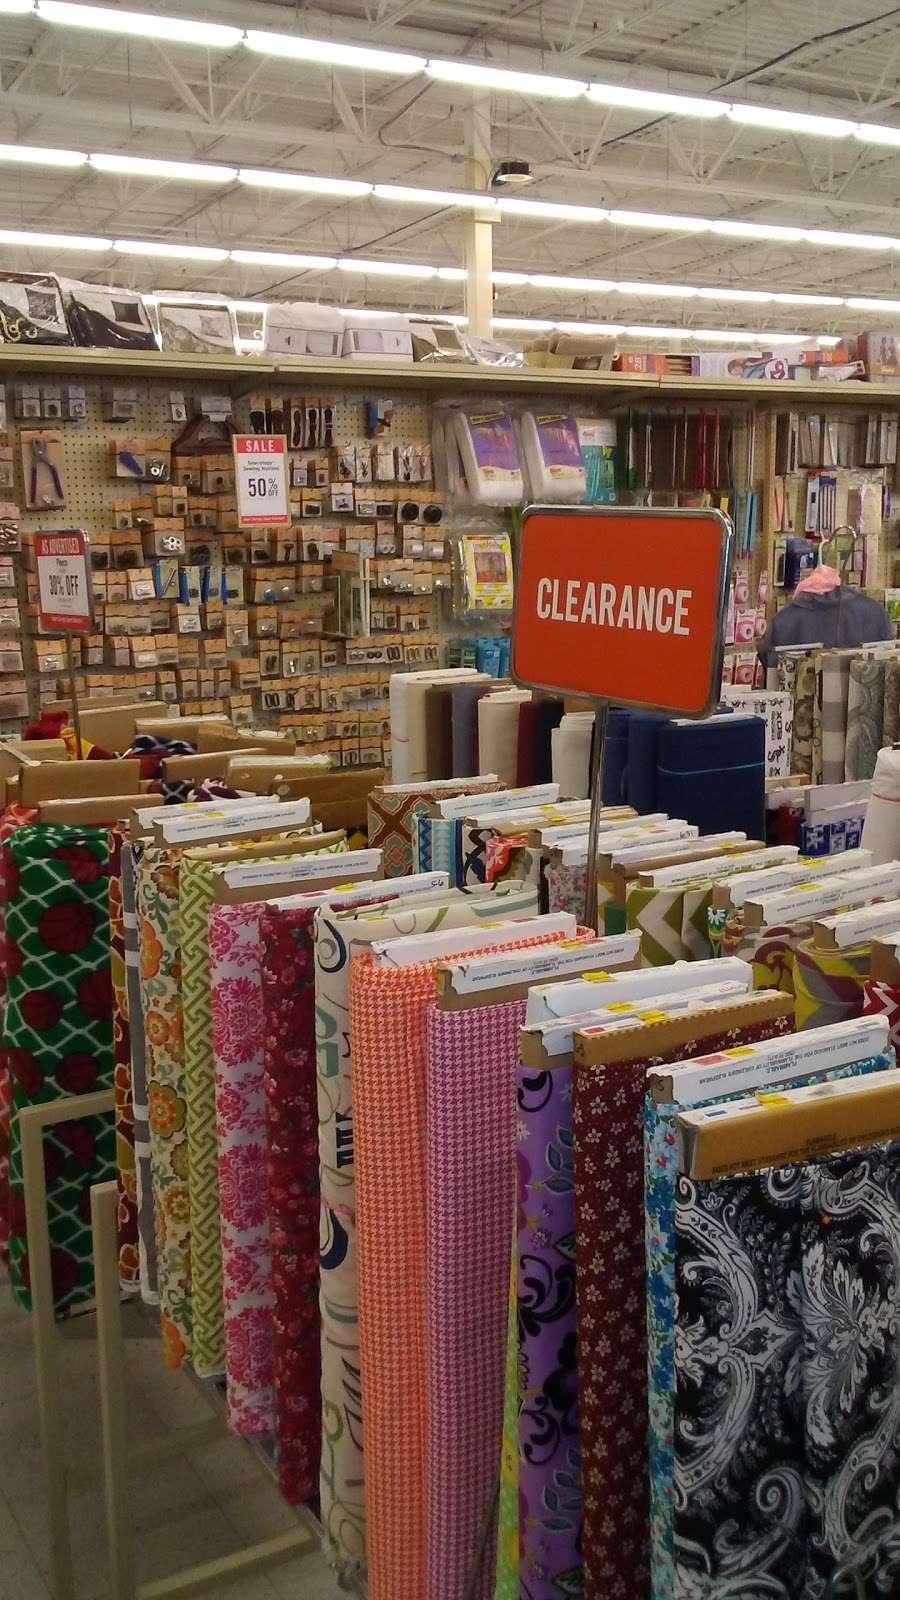 Hobby Lobby - home goods store  | Photo 5 of 10 | Address: 10575 E Washington St, Indianapolis, IN 46229, USA | Phone: (317) 897-1825